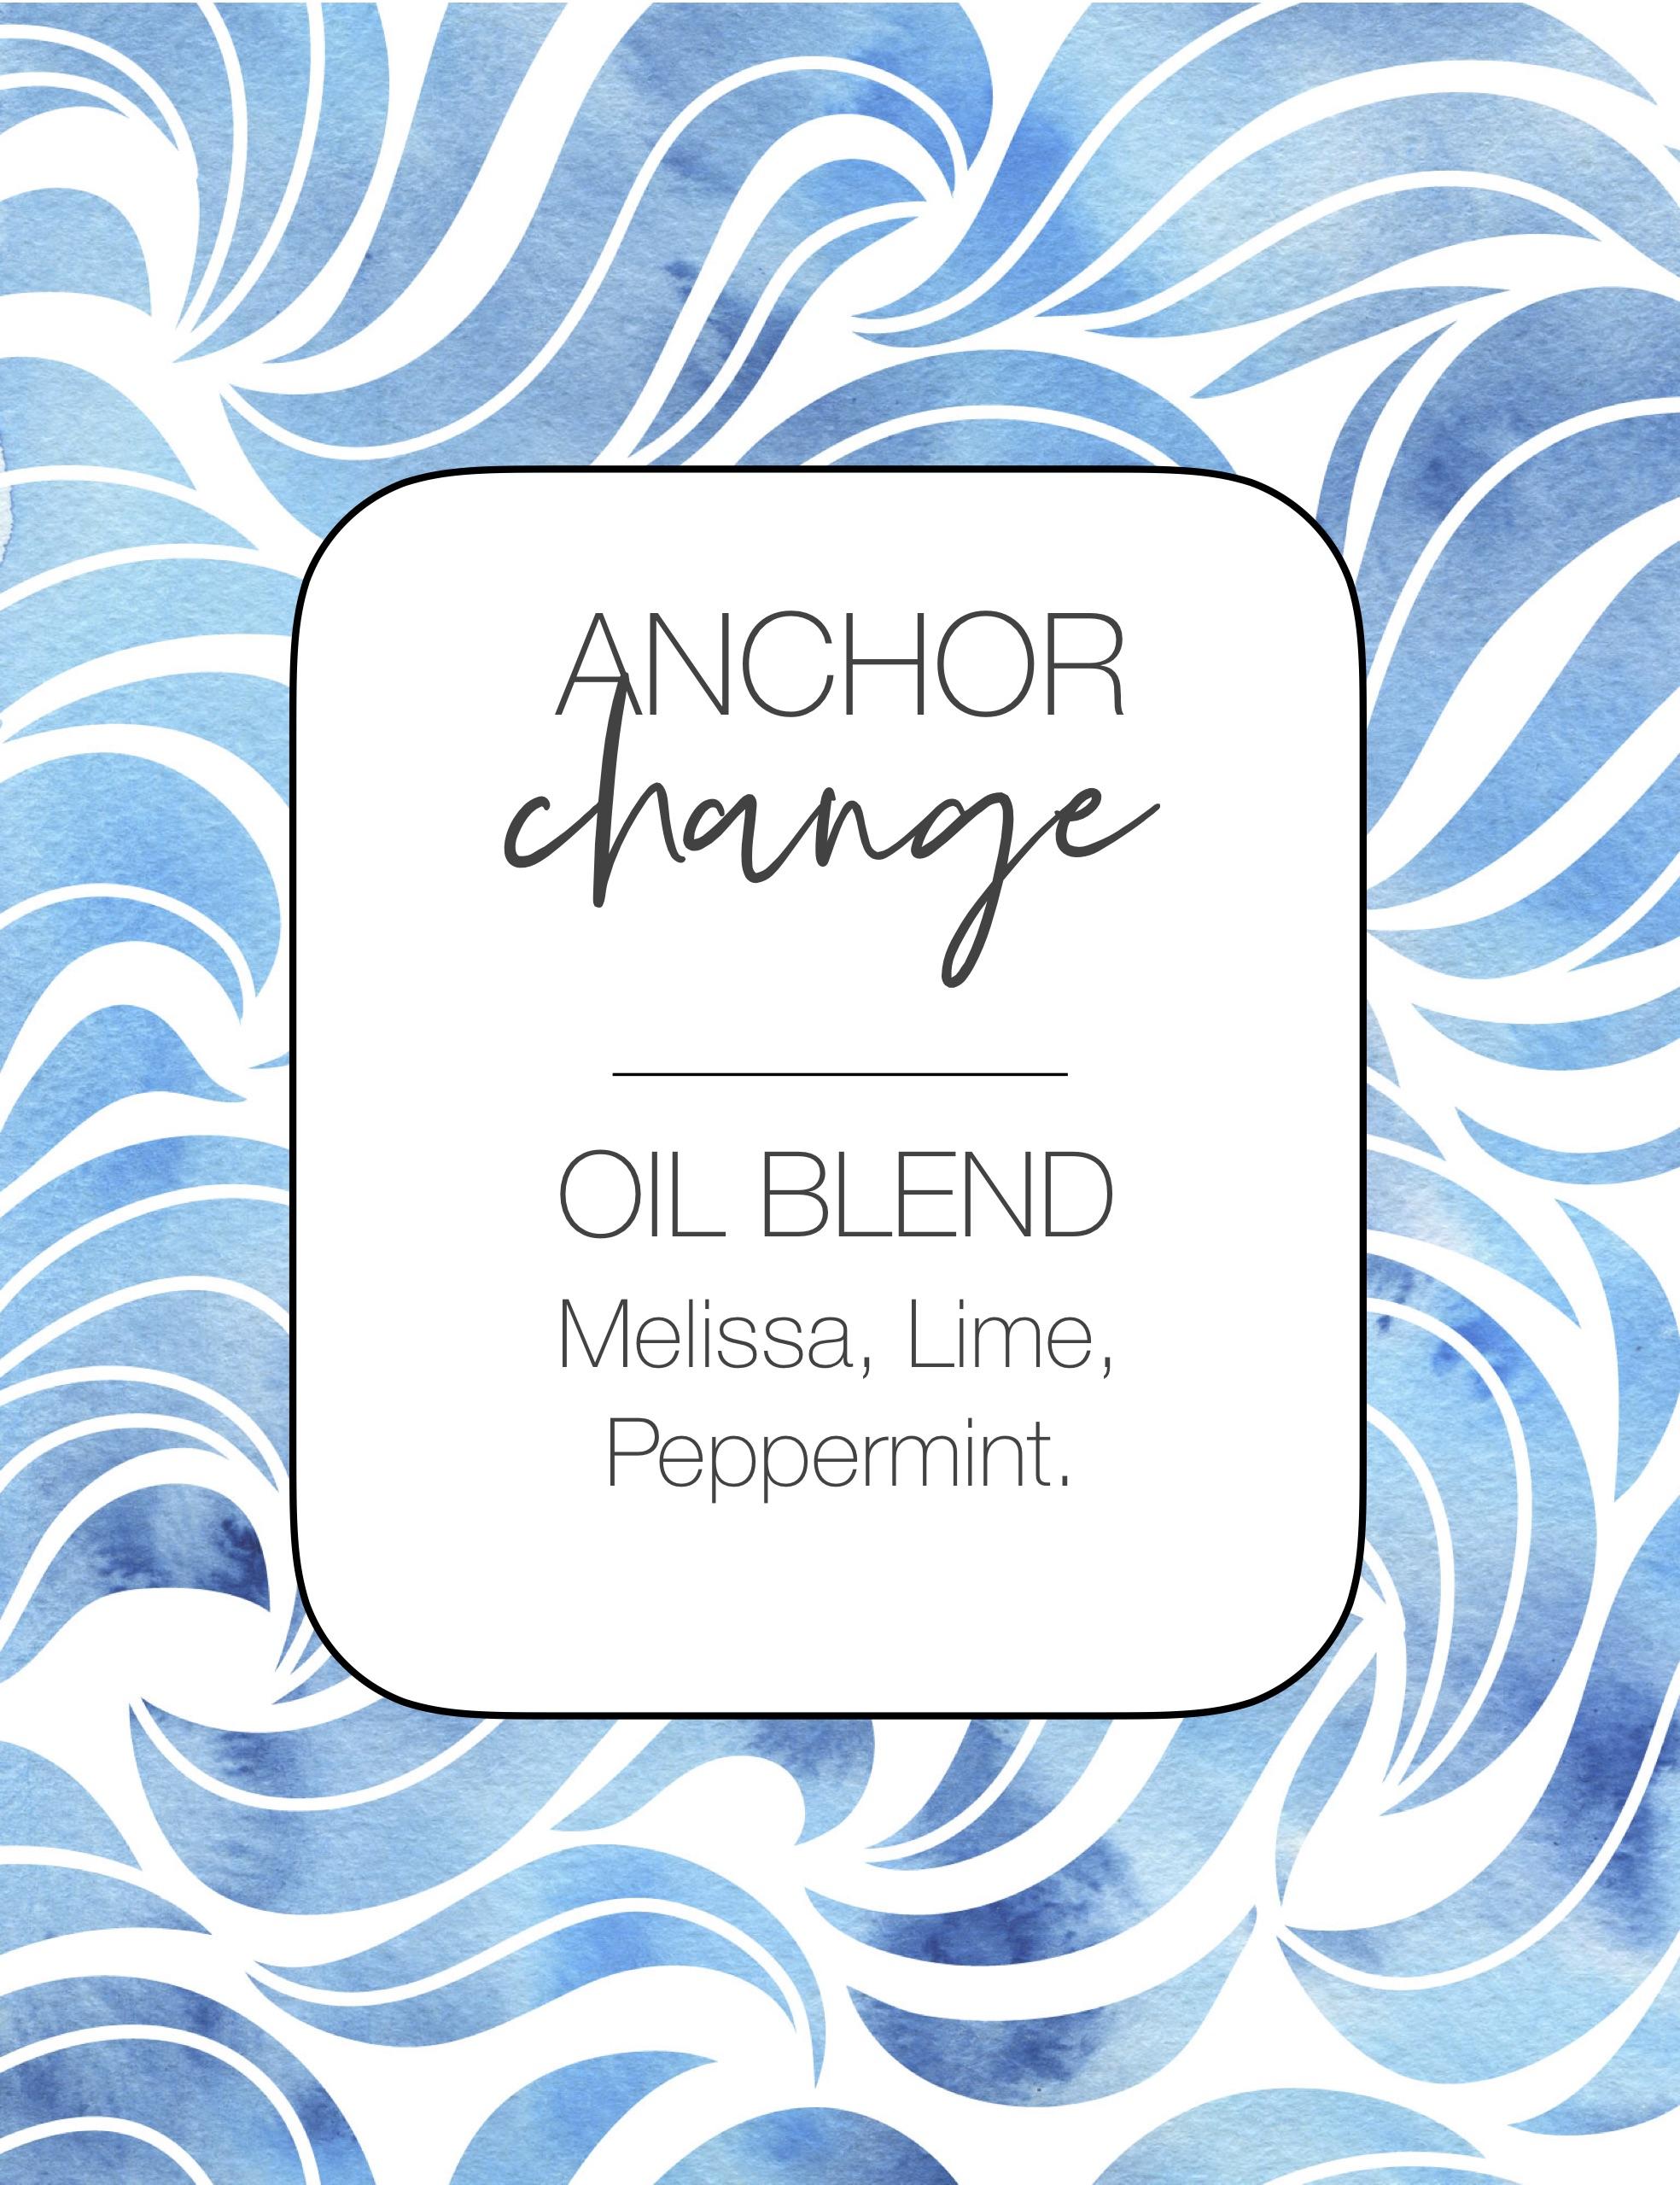 Anchor-Change-10ml-Roller-Bottle-Blend-Label-JPEG.jpg